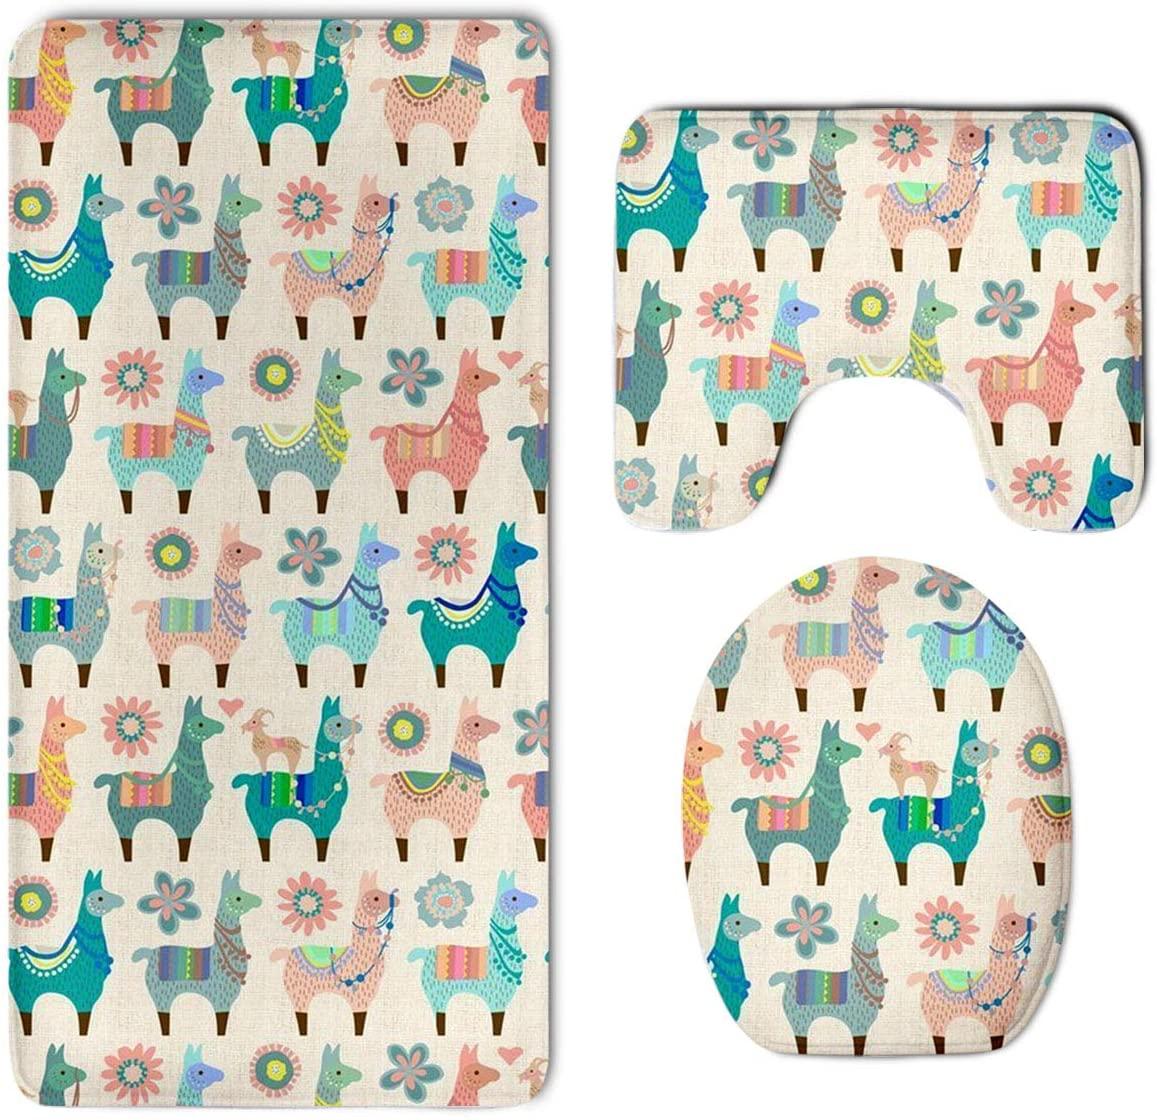 Colorful Llama Fun Skidproof Toilet Seat U Shape Cover Bath Mat Lid Cover 3 Piece Non Slip Bath Rug Mats Sets for Shower SPA